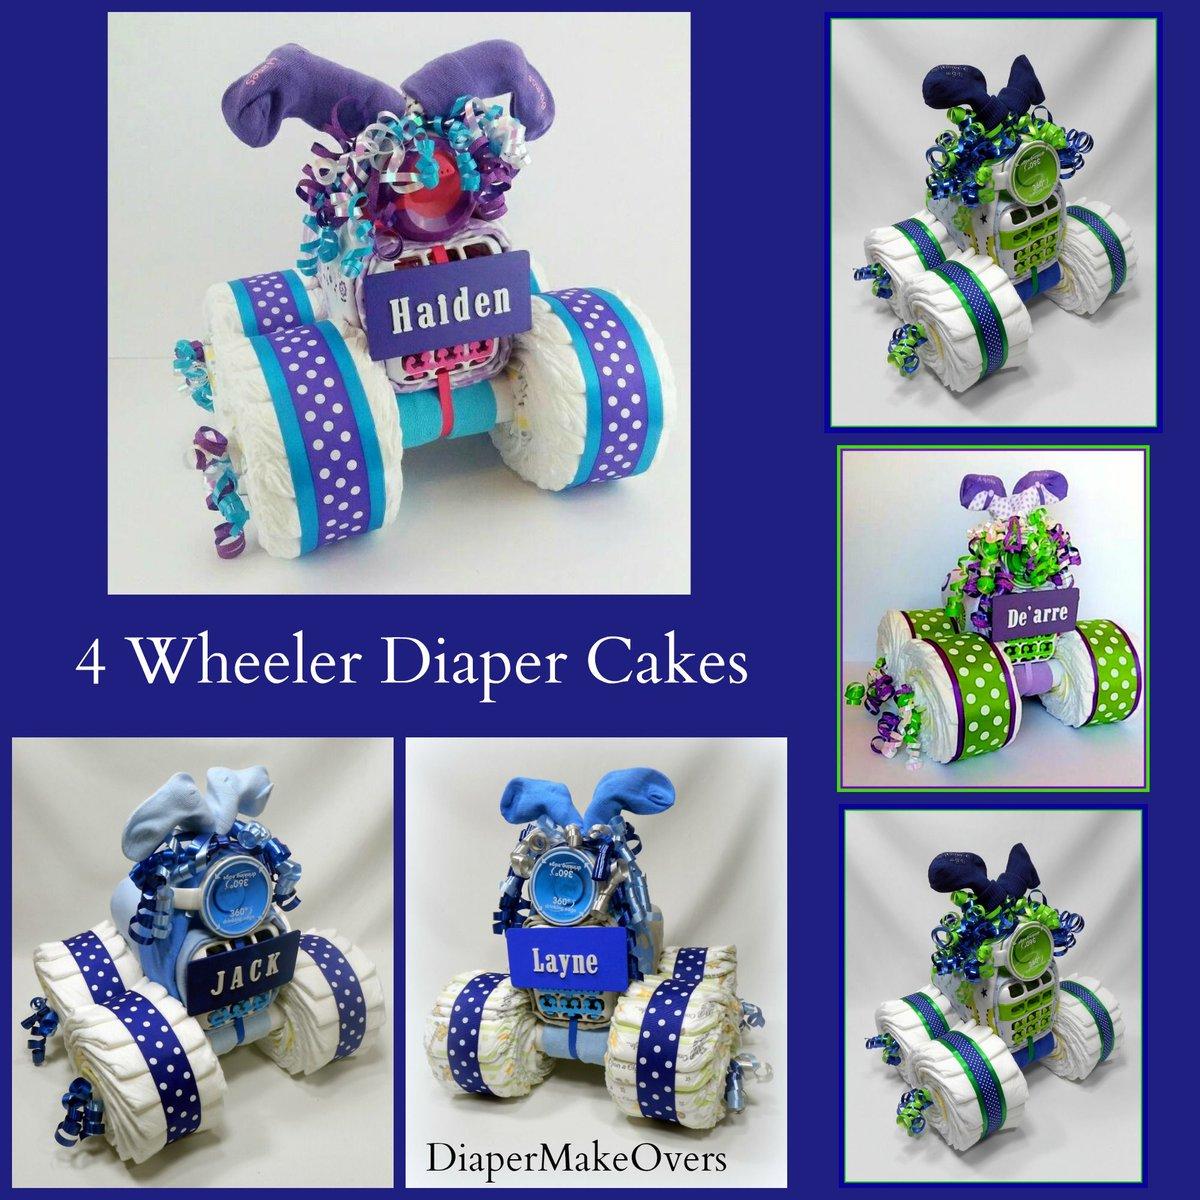 https://buff.ly/2ZTE40e #epiconetsy #shopsmall #etsyshop #babyshower #diapercake #babygift #4wheeler #offroad #dadgifts #handmadegiftspic.twitter.com/By1Kkv15Nn